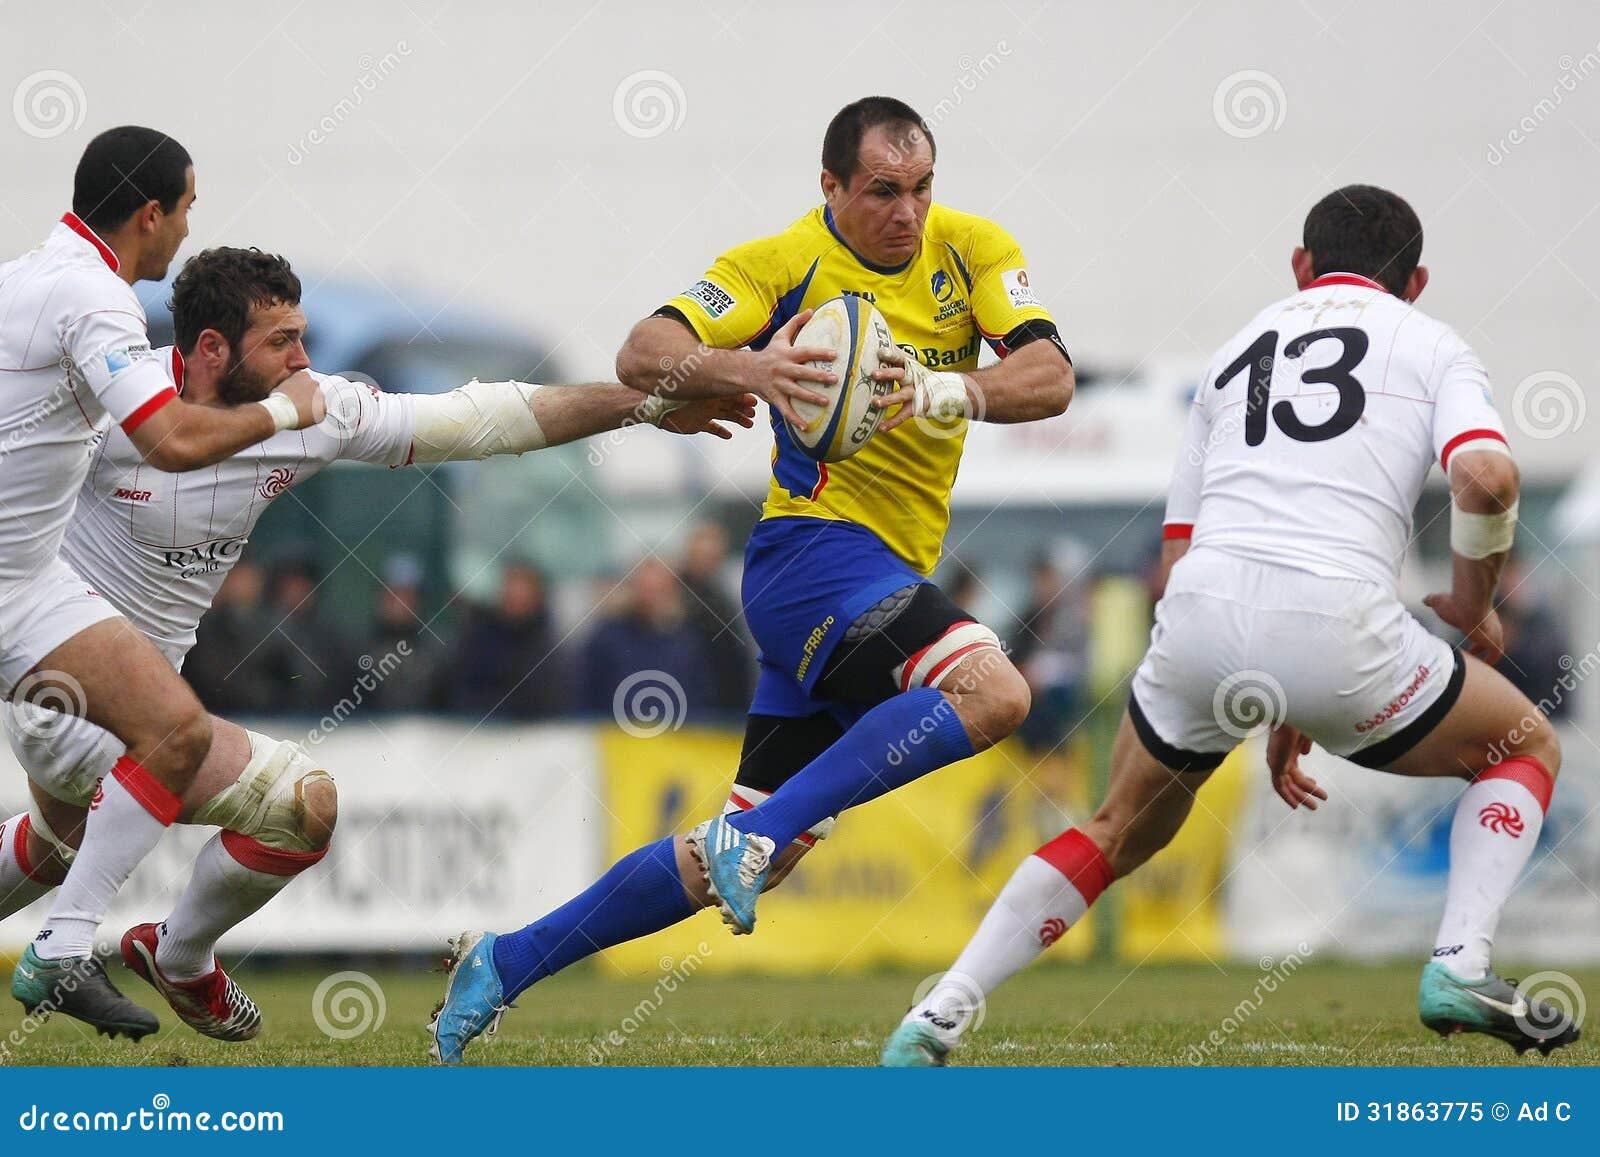 Romania-Georgia Rugby